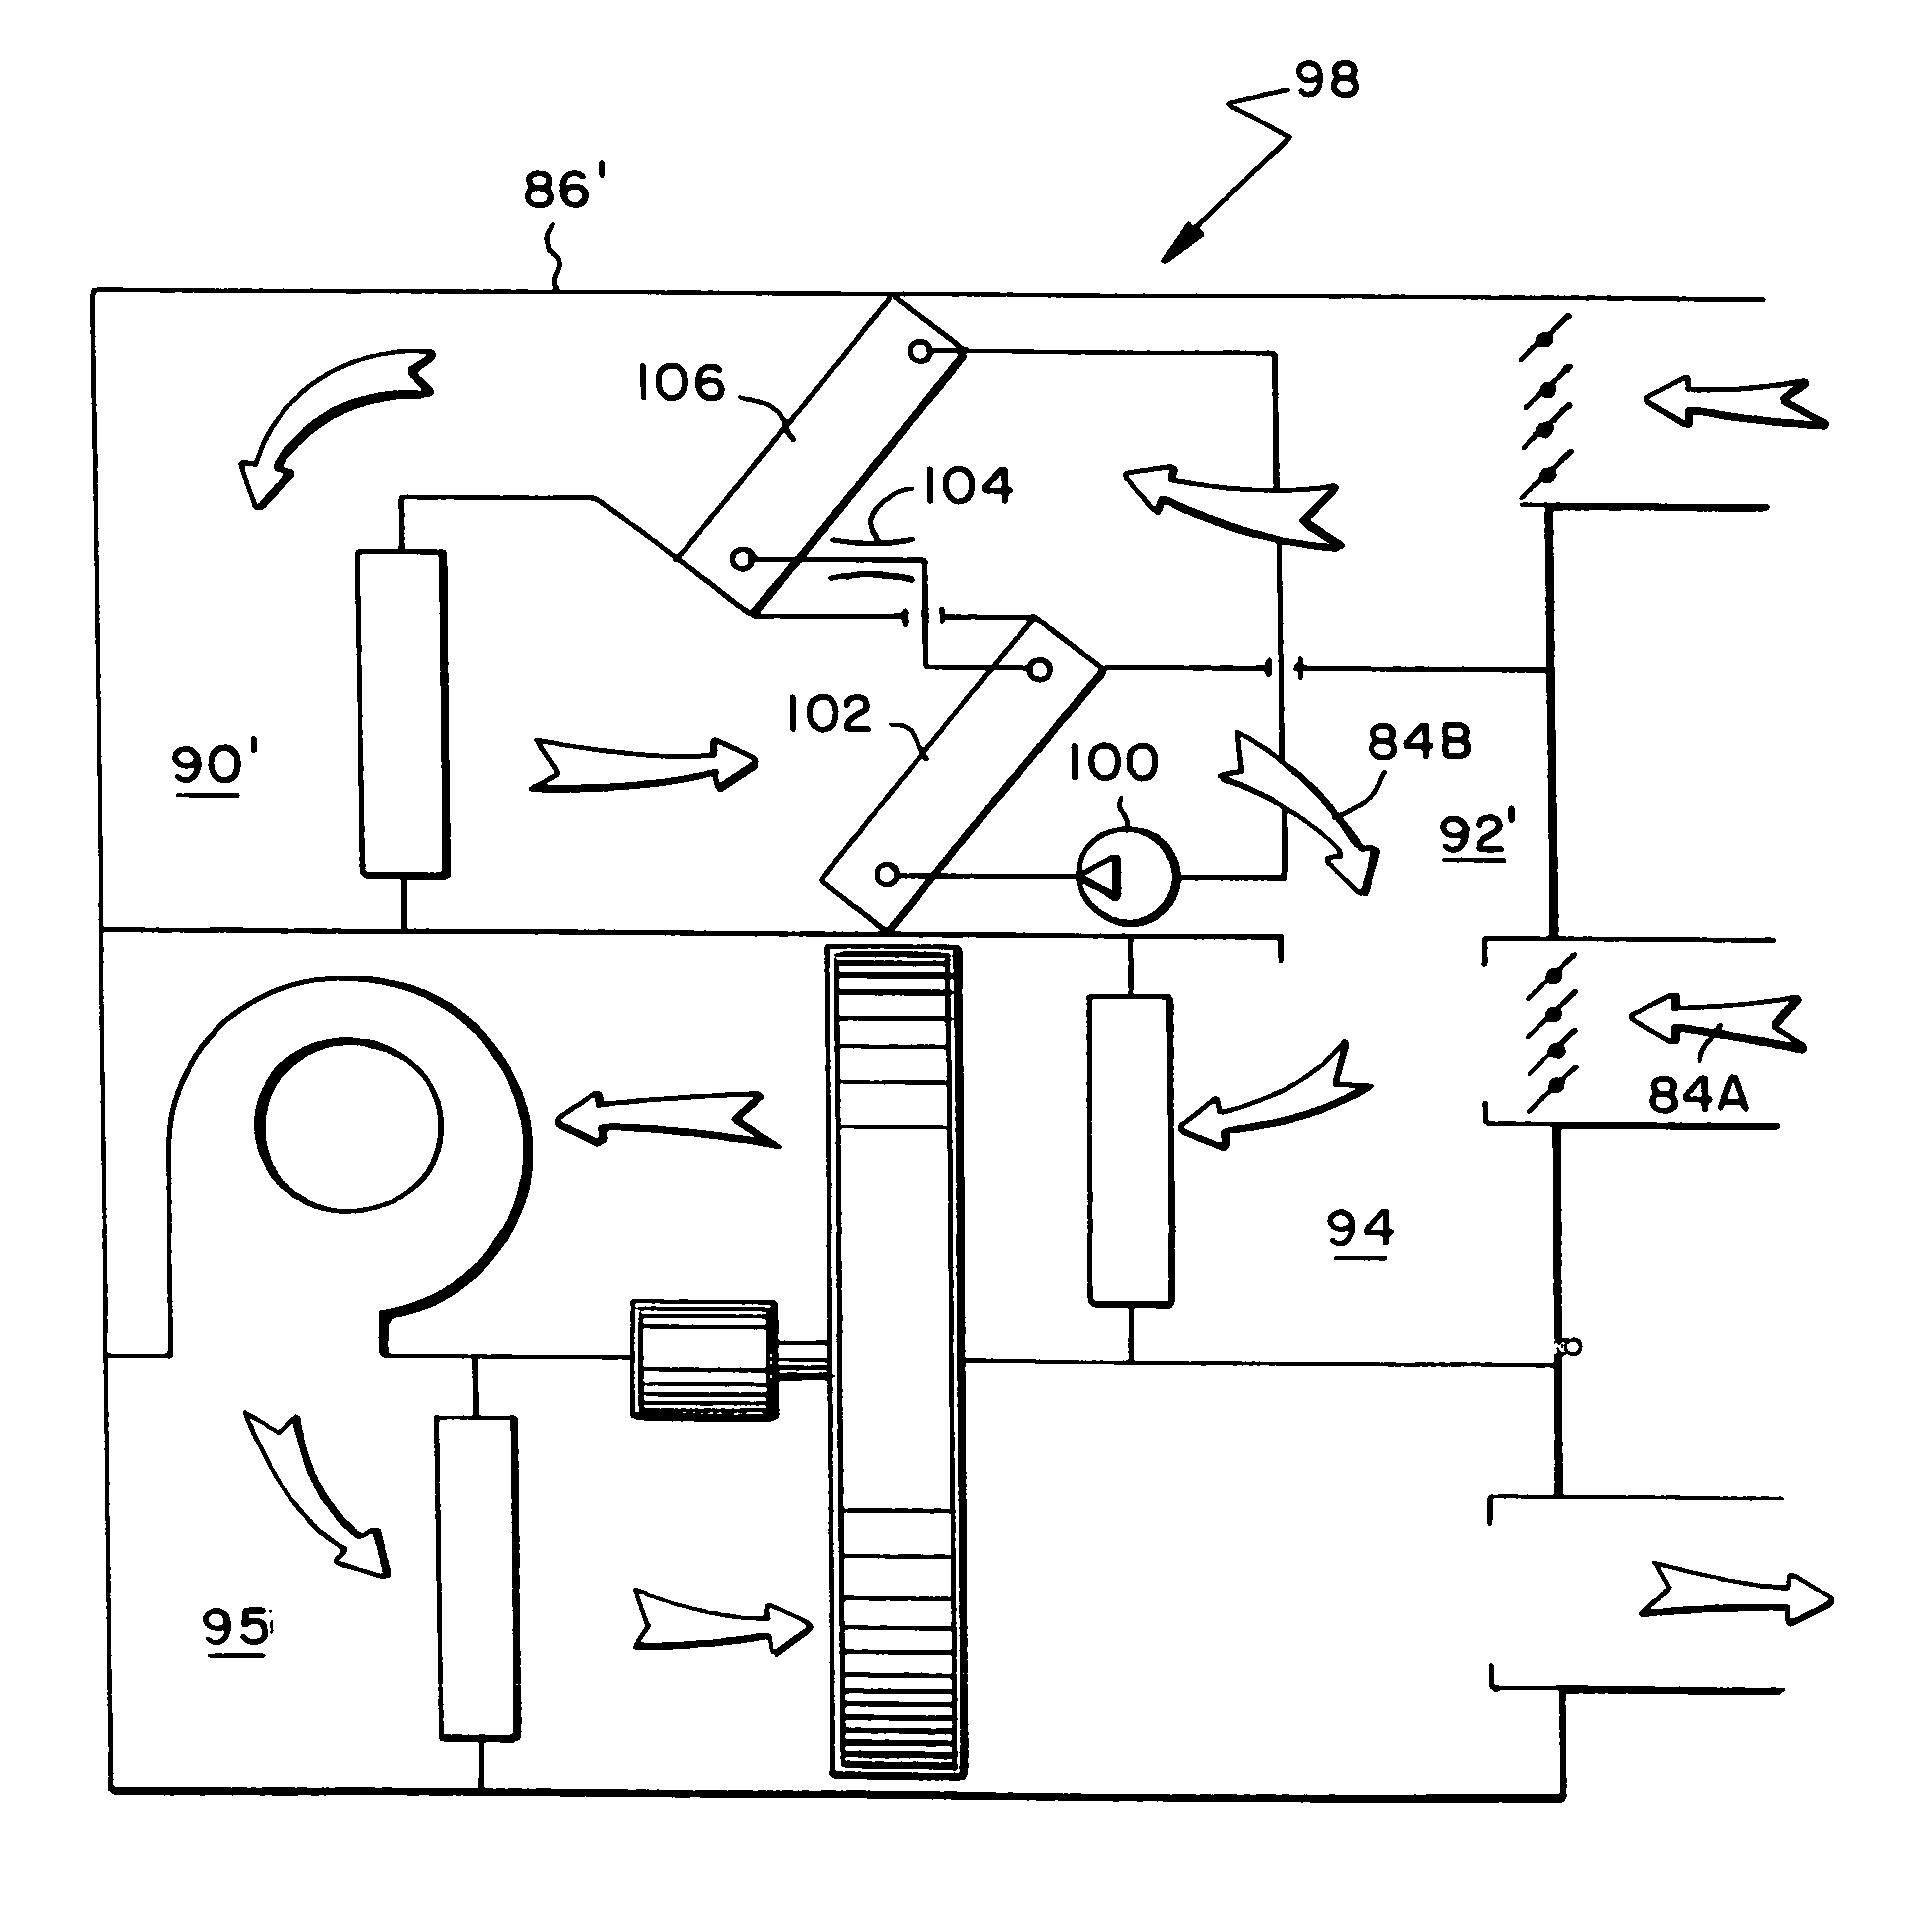 Patent Us7340906 Hvac Desiccant Wheel System And Method Google Control Logic Diagram Drawing